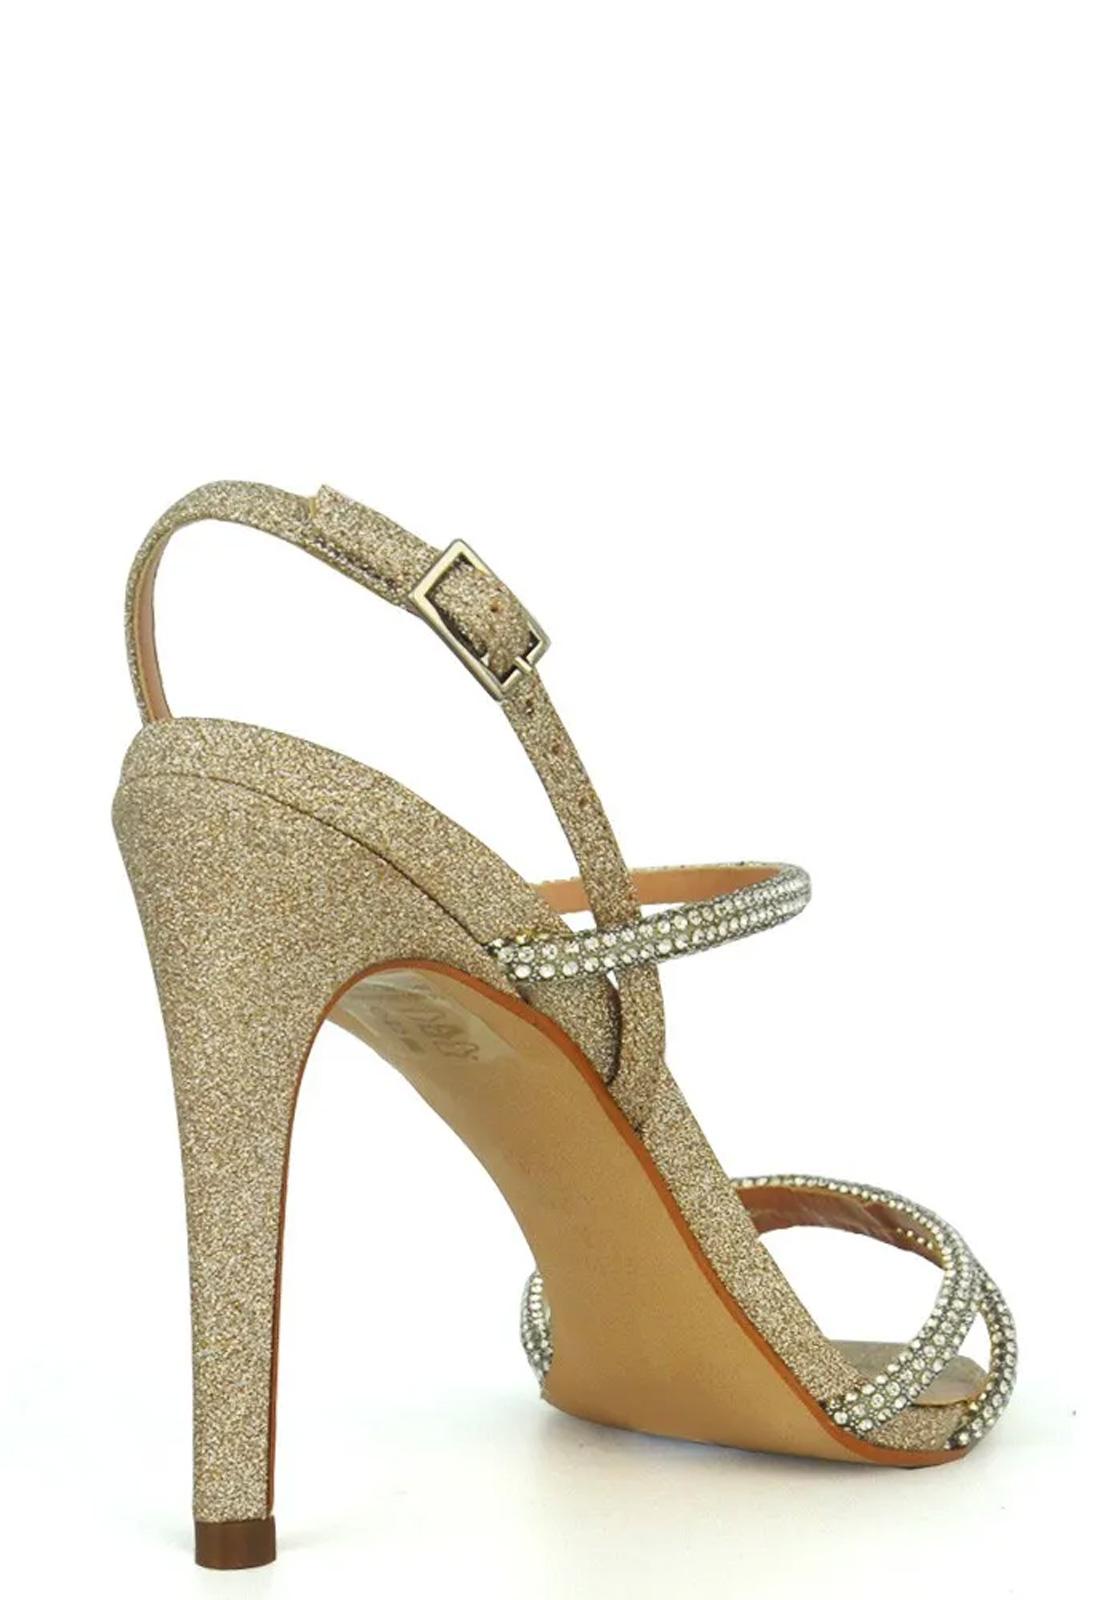 Sandália De Tiras Strass E Glitter